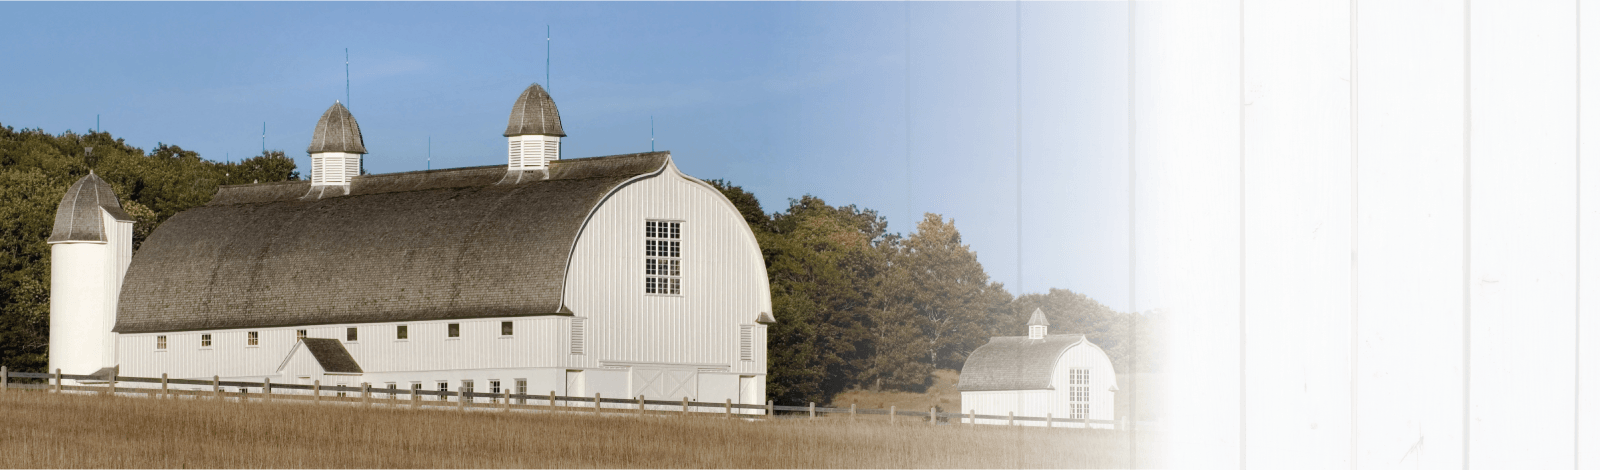 FarmPaint White Barn Paint